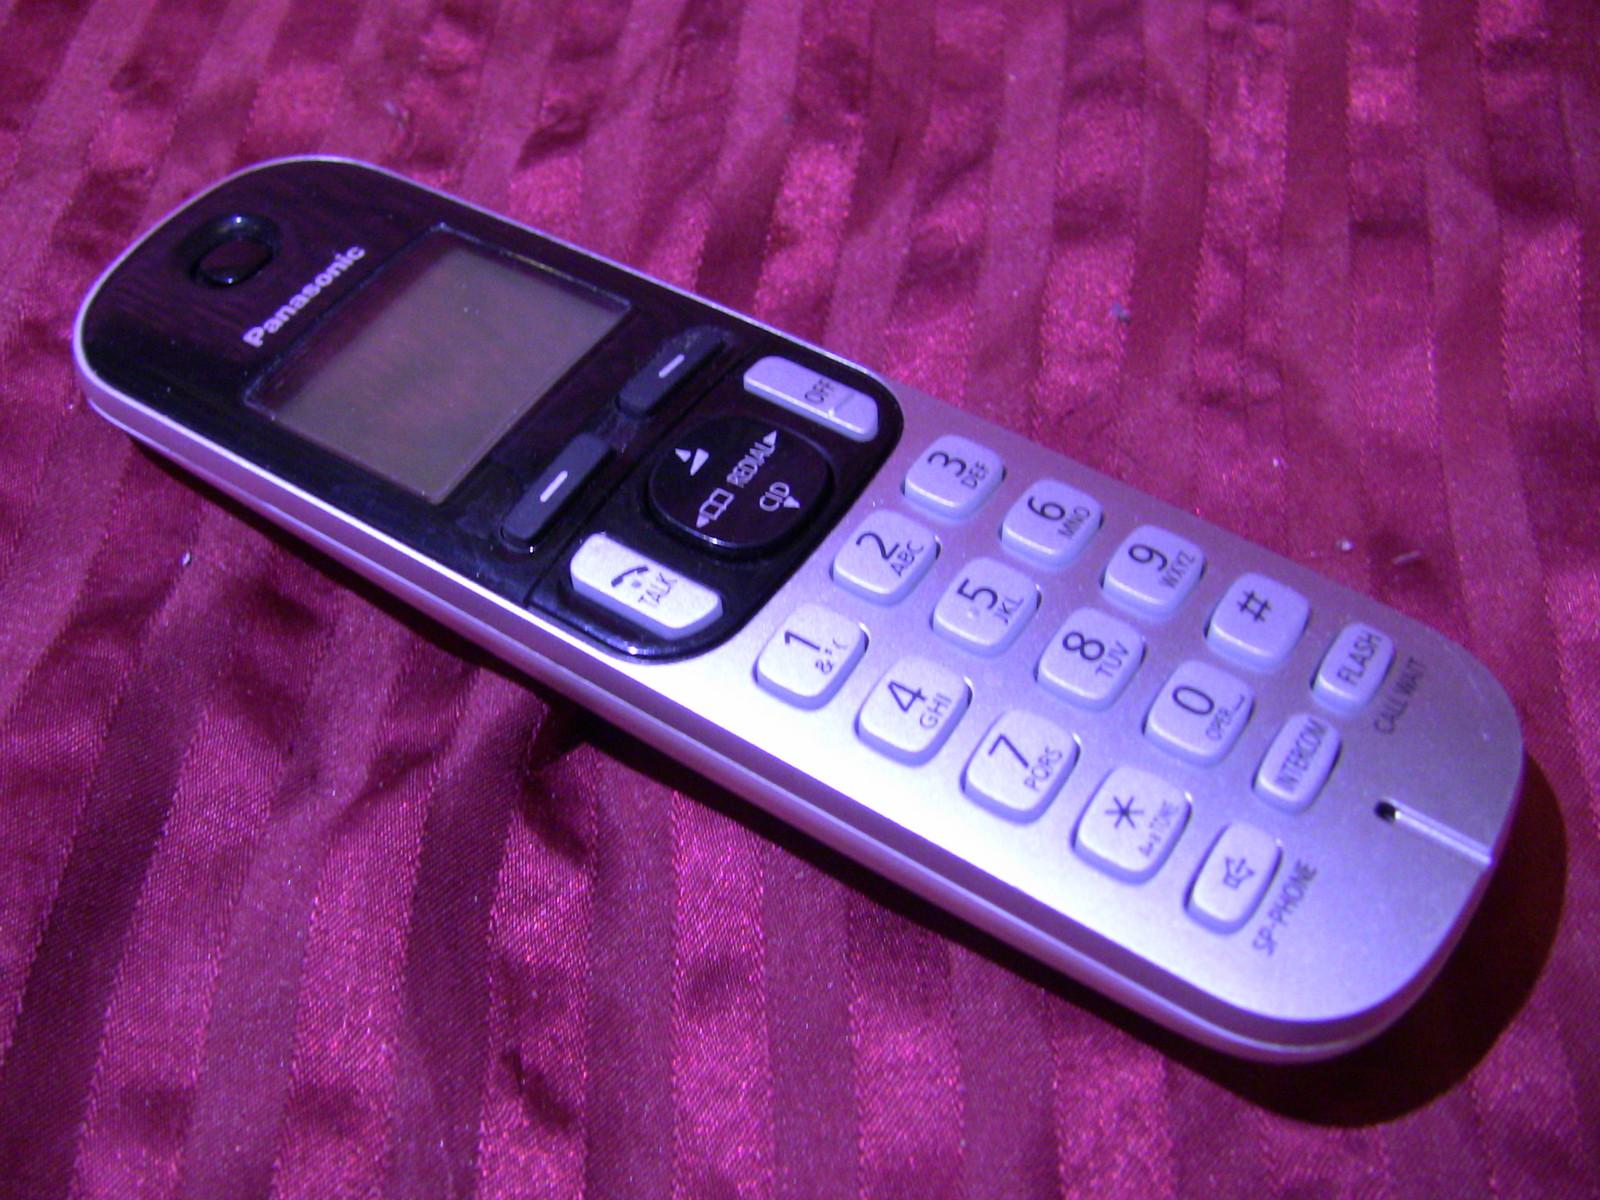 Cordless Handset Panasonic KX-TGCA21S KXTGCA21 S for KXTGC220 Phone